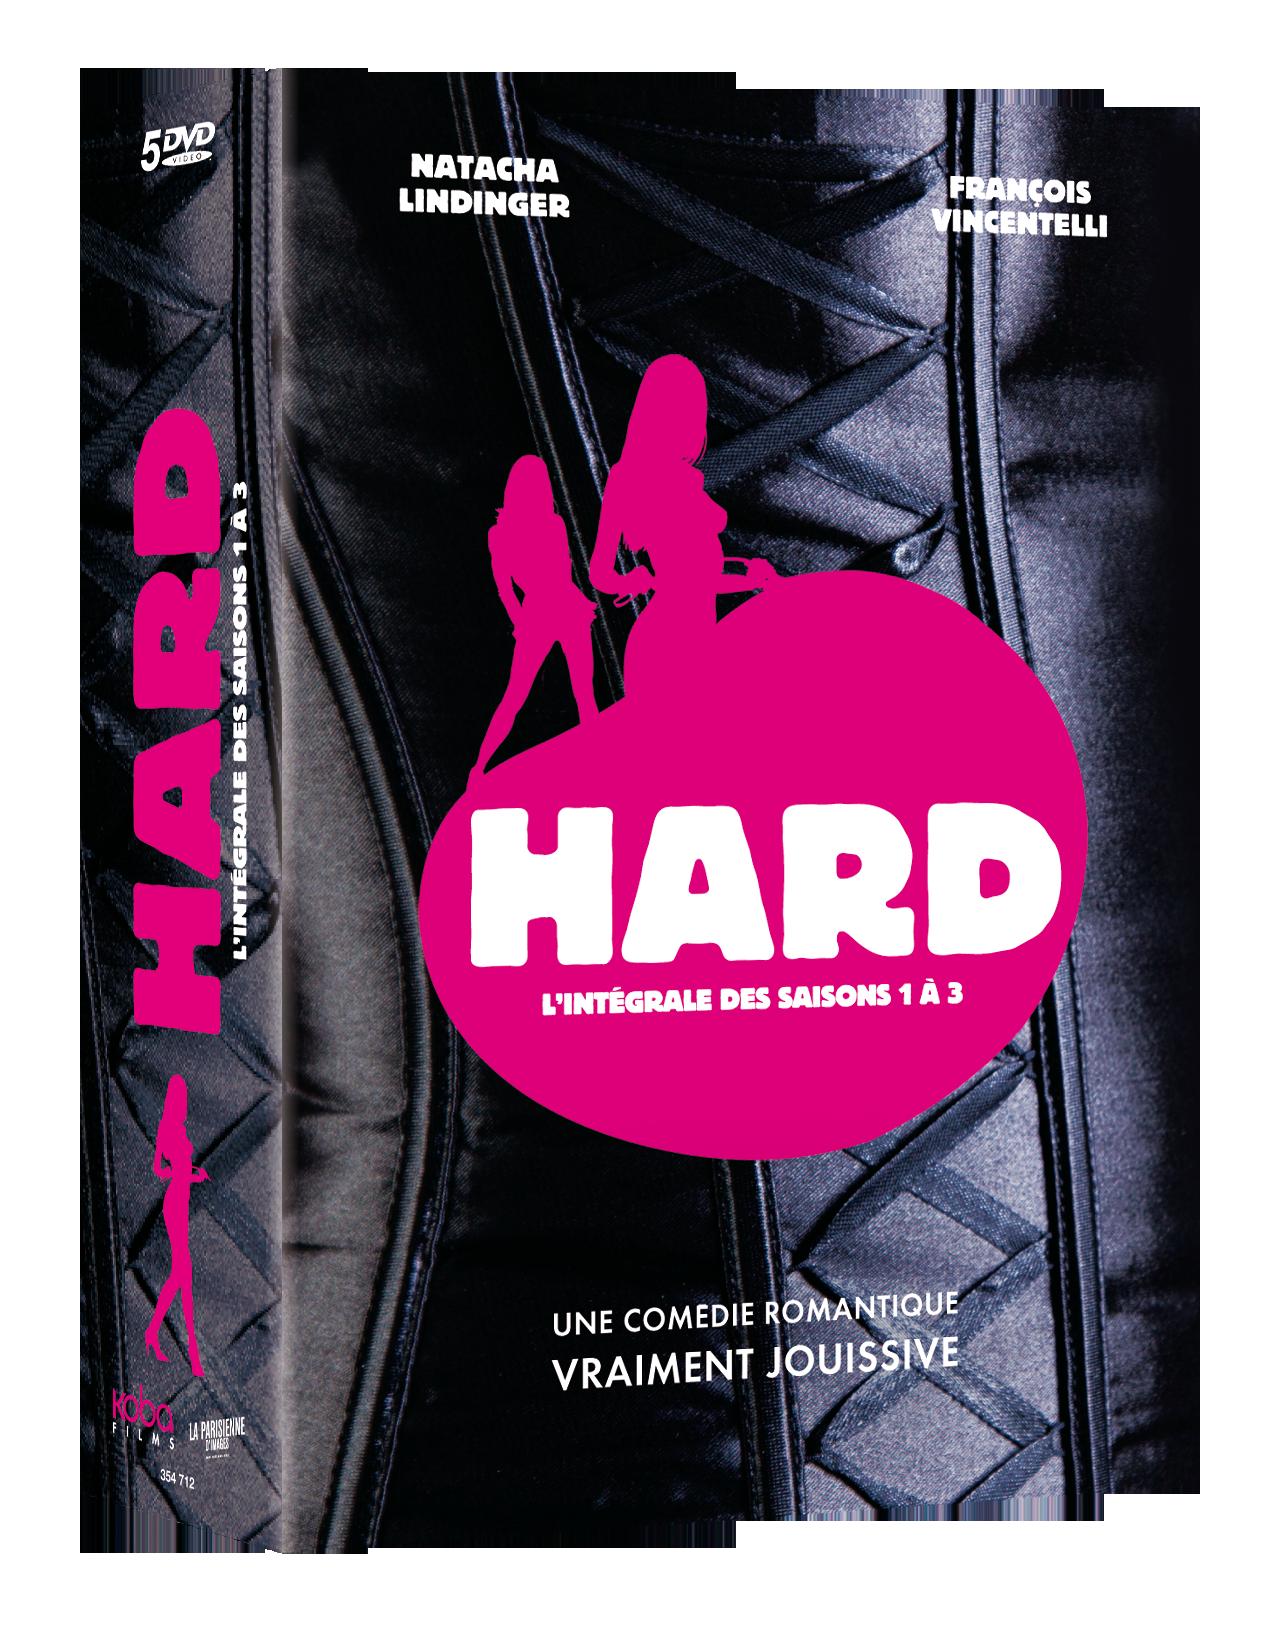 HARD - COFFRET INTEGRALE SAISONS 1 à 3 (5 DVD)